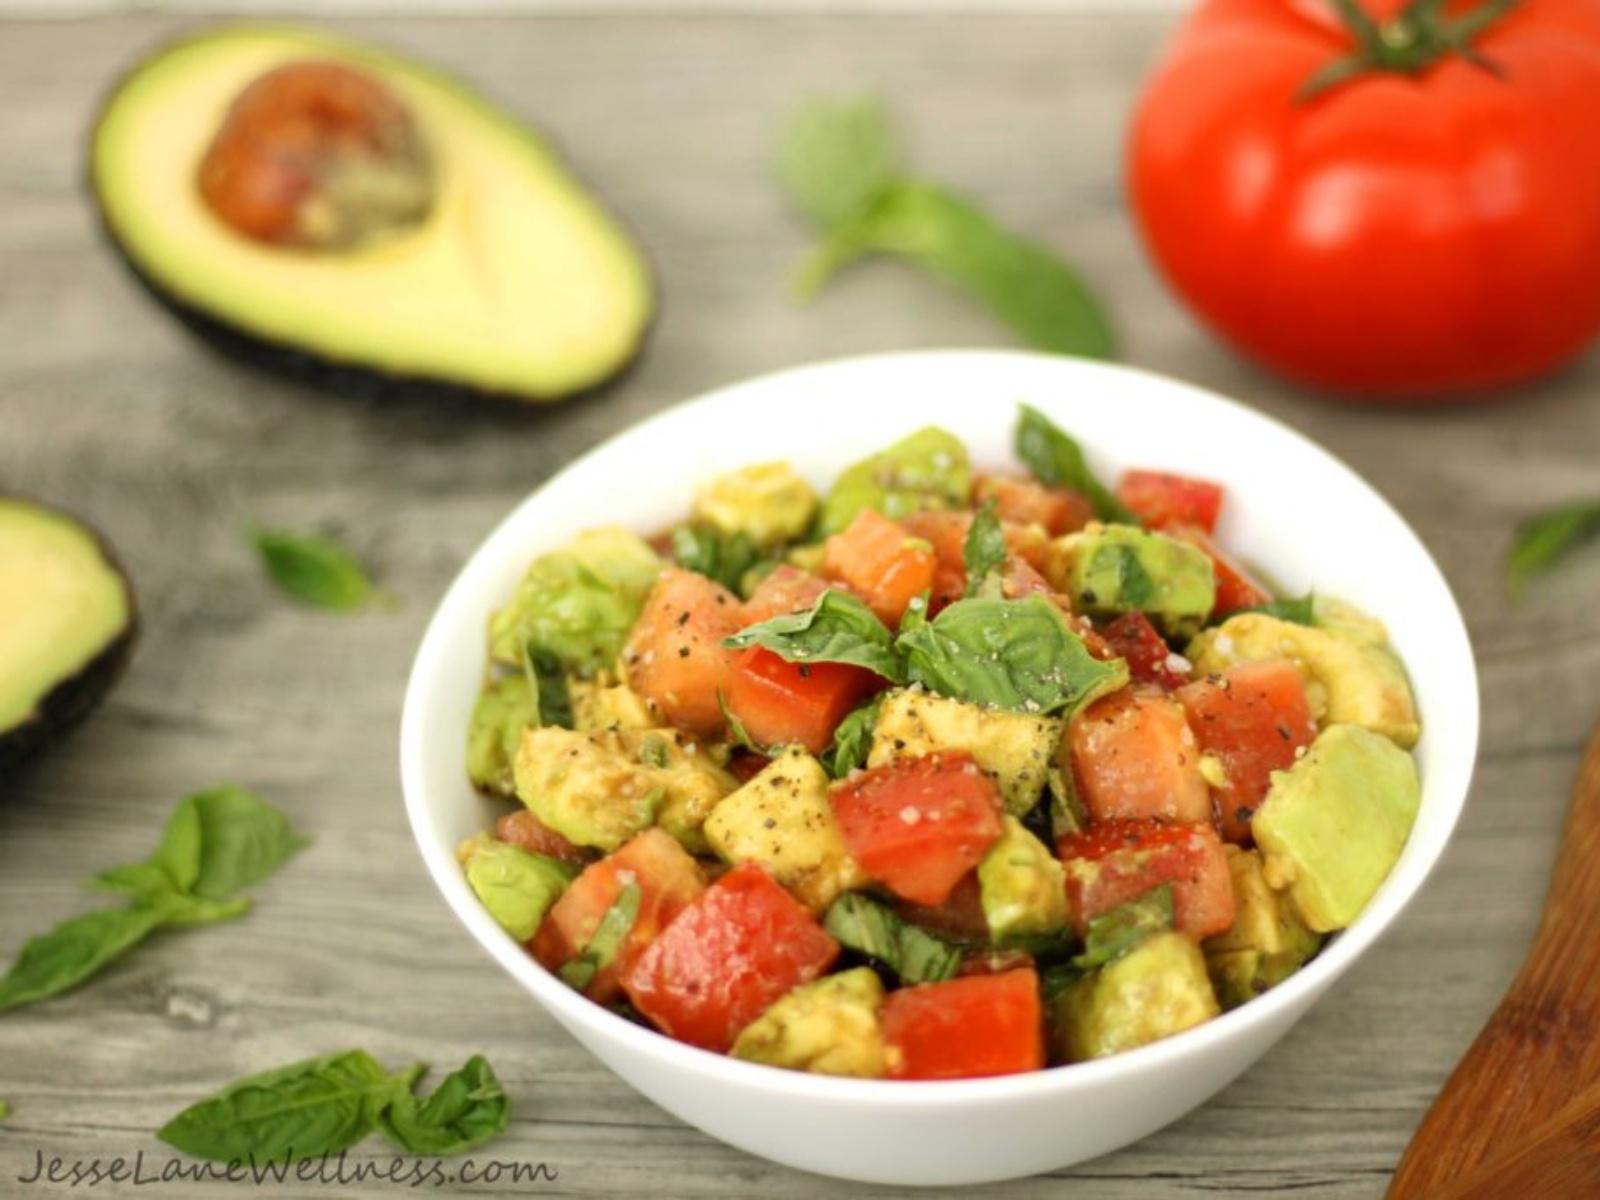 Summer Tomato Basil and Avocado Salad